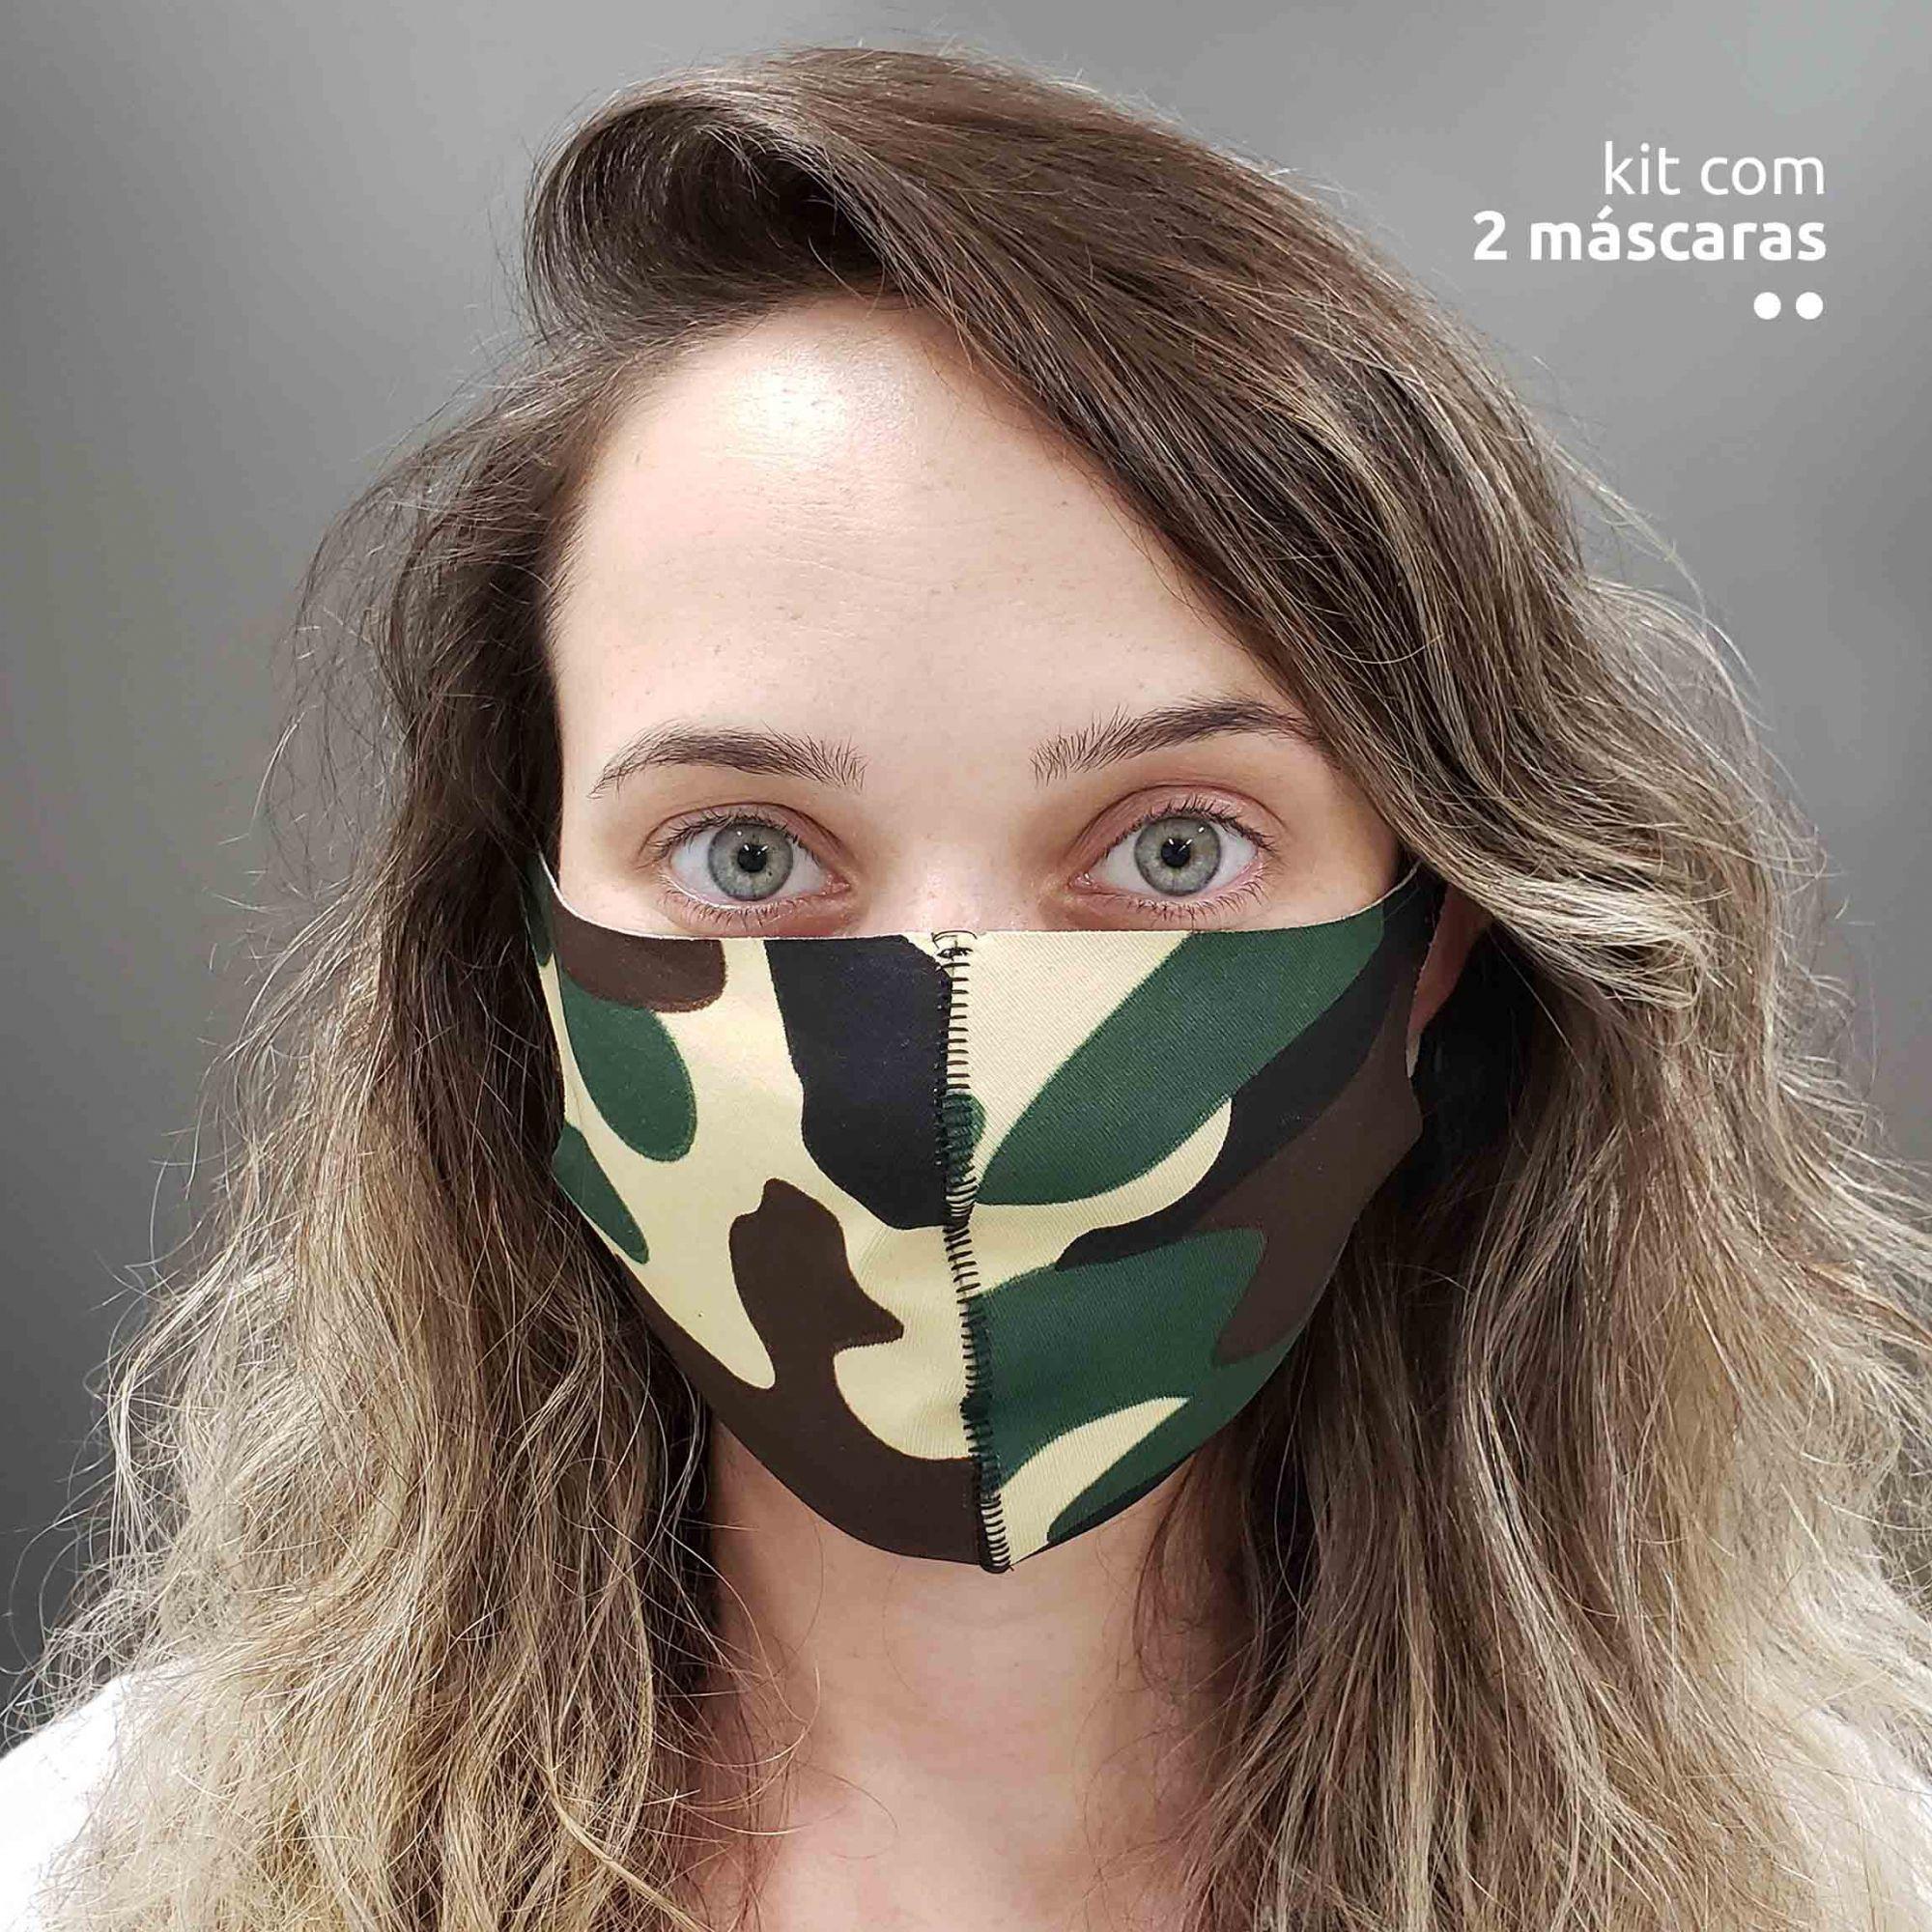 KIT 2 máscaras fashion ninja - Estampa militar